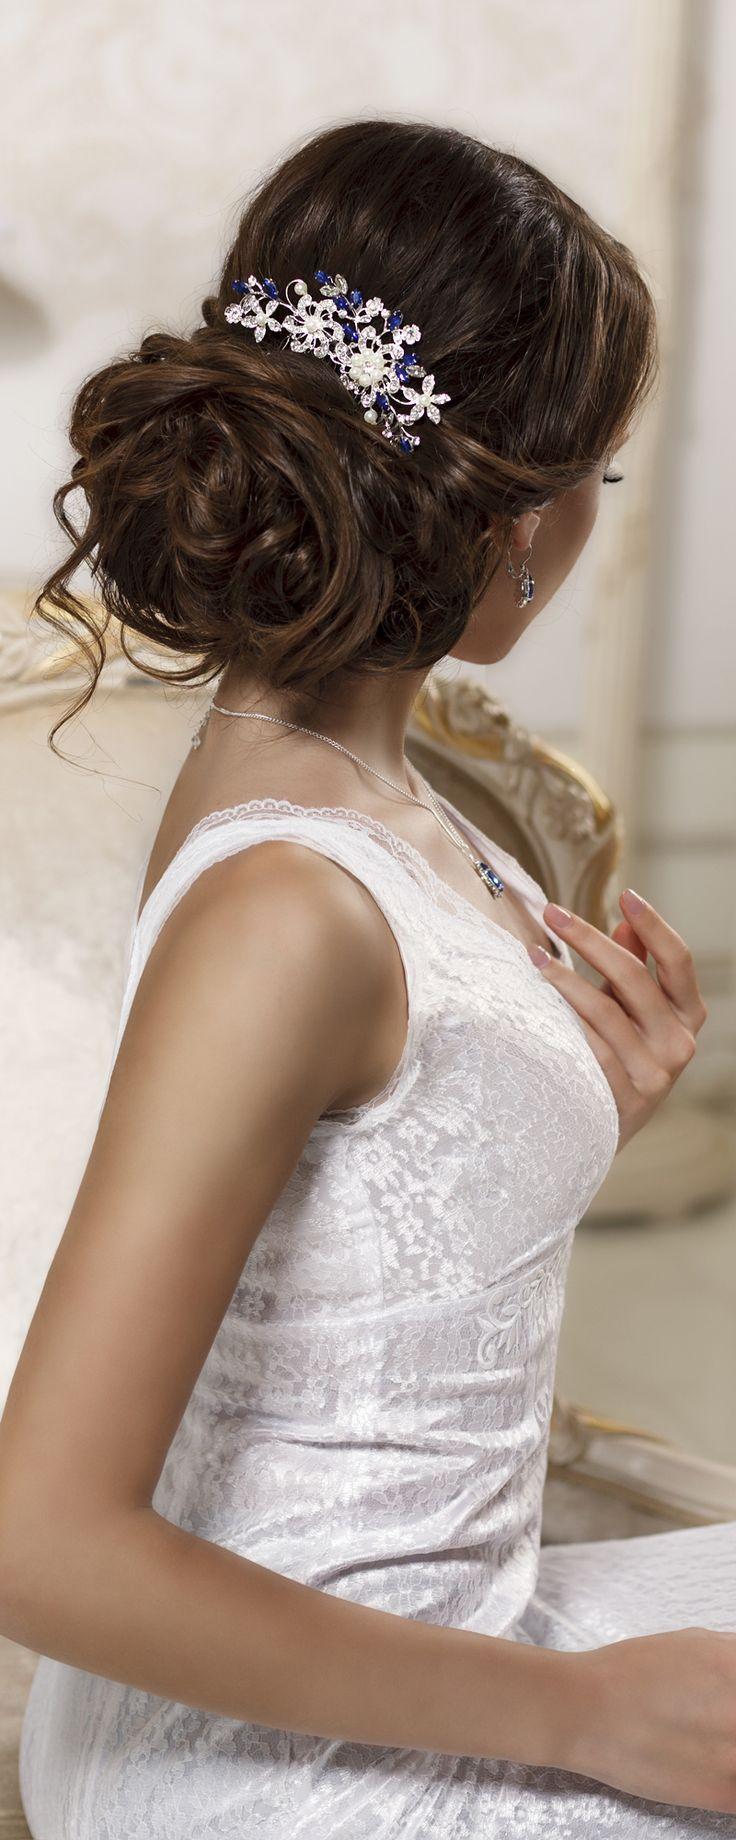 Mariage - Wedding Hairstyles